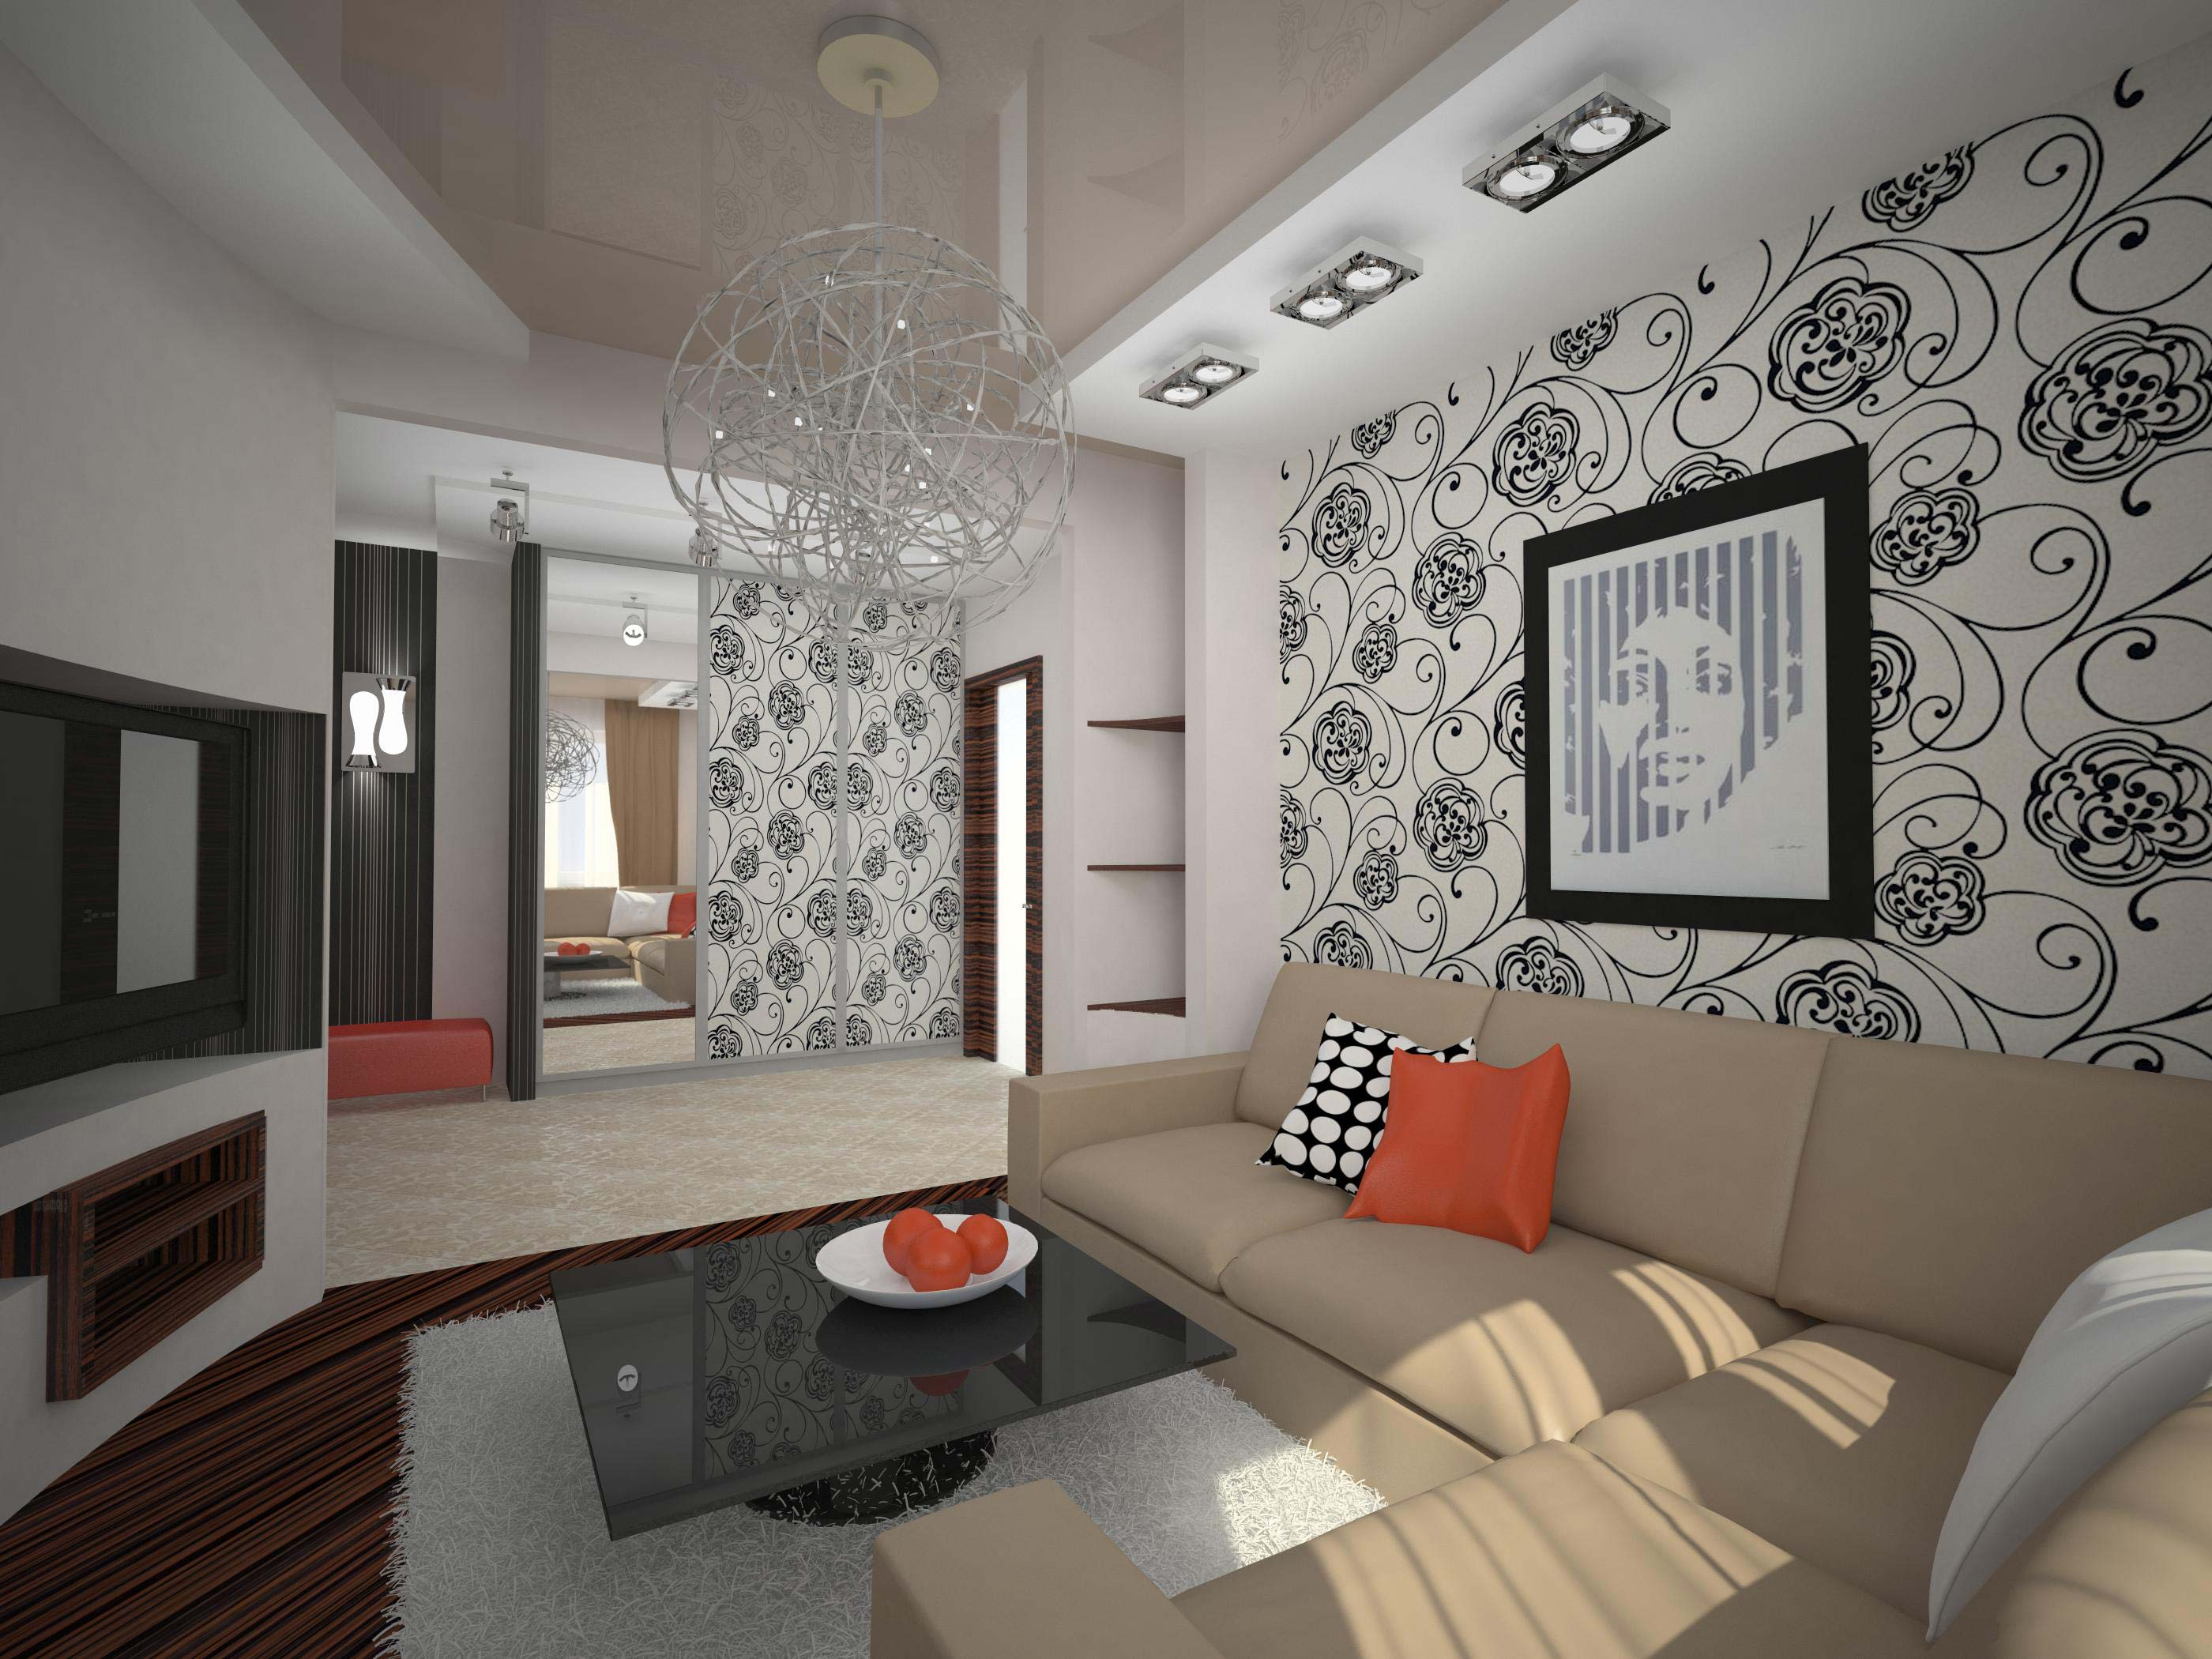 Ремонт квартир зал дизайн